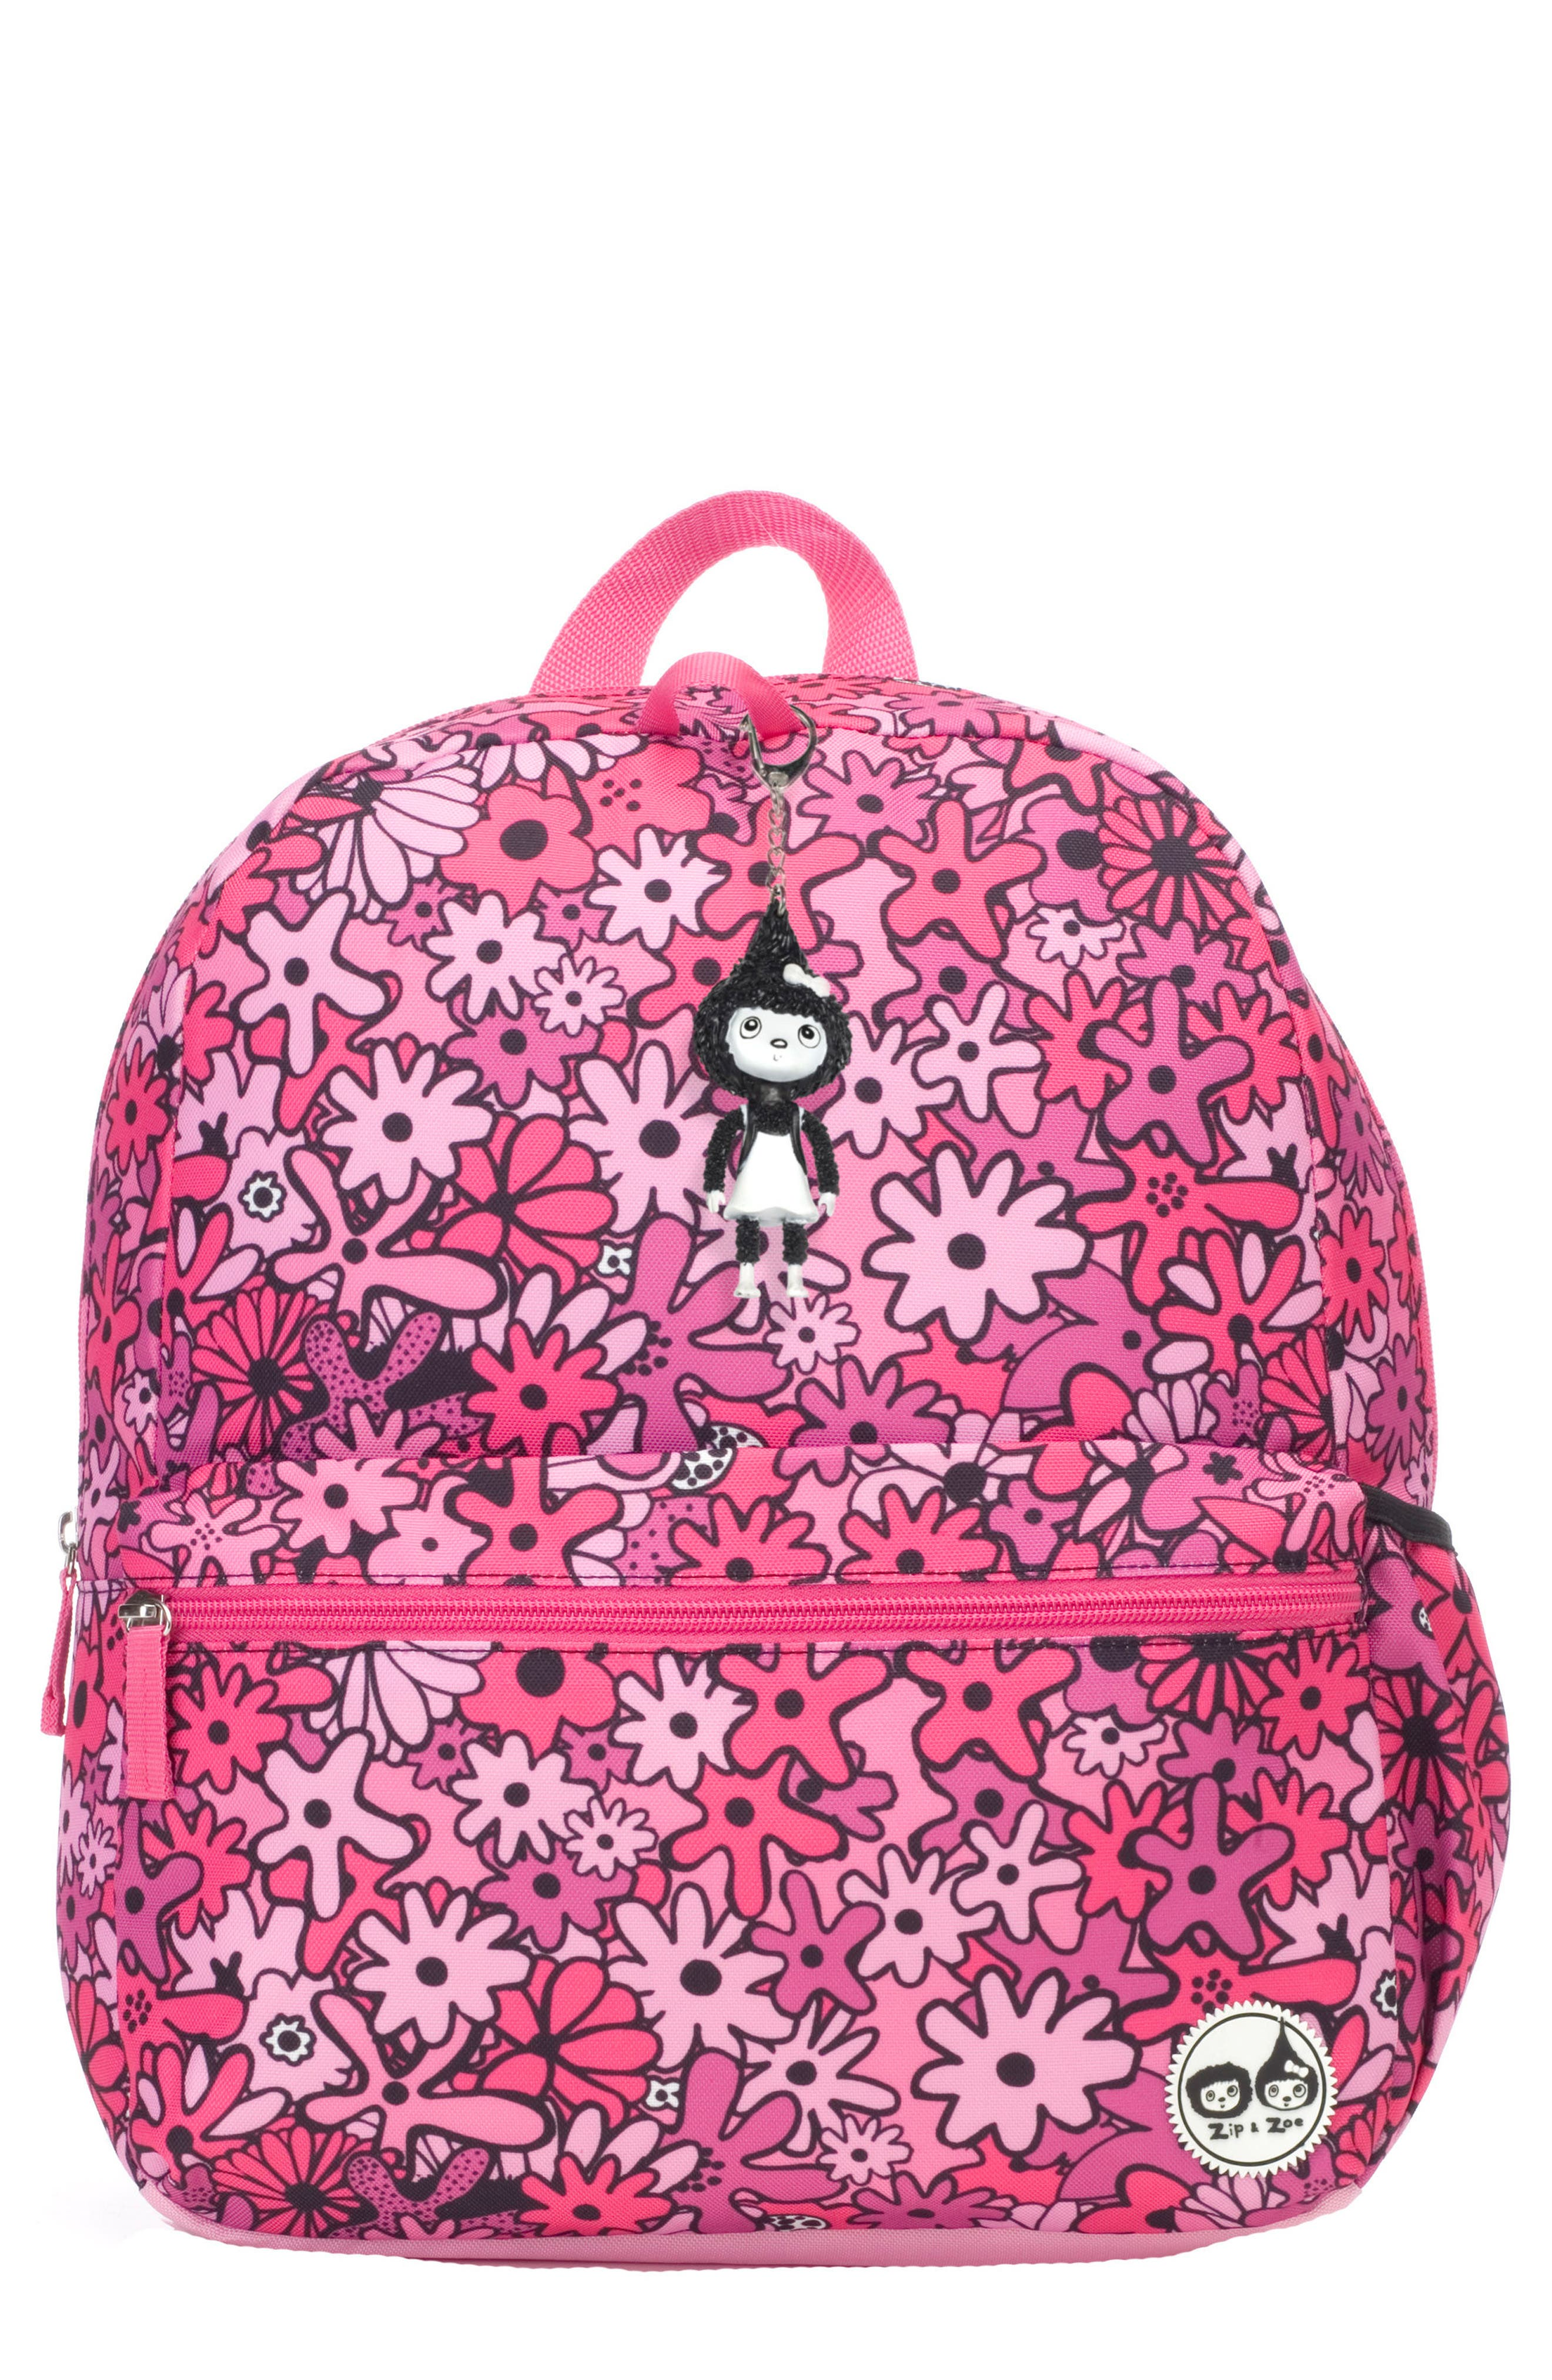 Zip & Zoe Floral Junior Backpack,                             Main thumbnail 1, color,                             FLORAL PINK